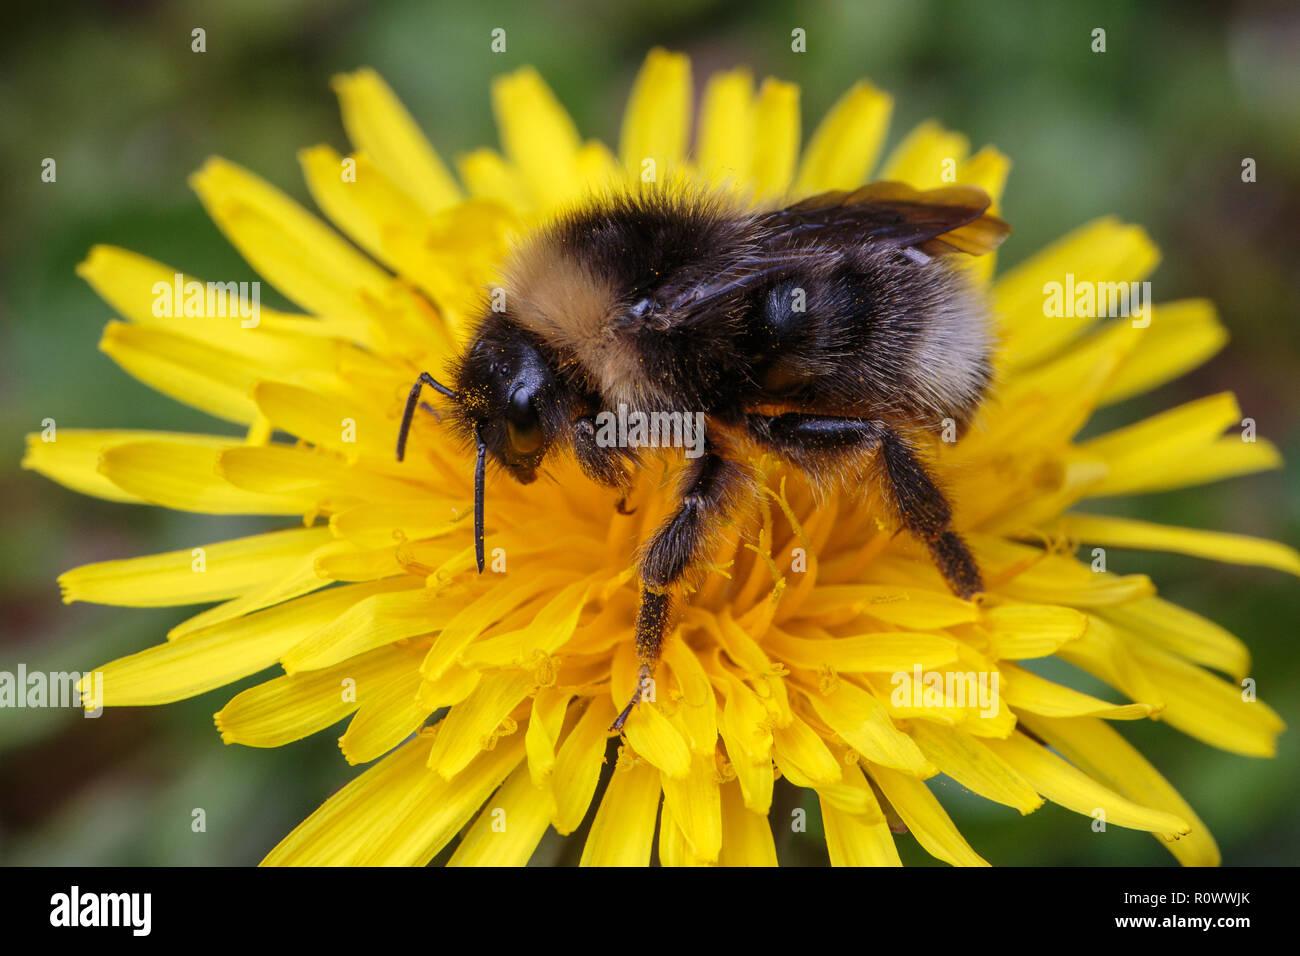 Forest Cuckoo Bumblebee, Bombus sylvestris, female feeding on Dandylion flowerhead - Stock Image